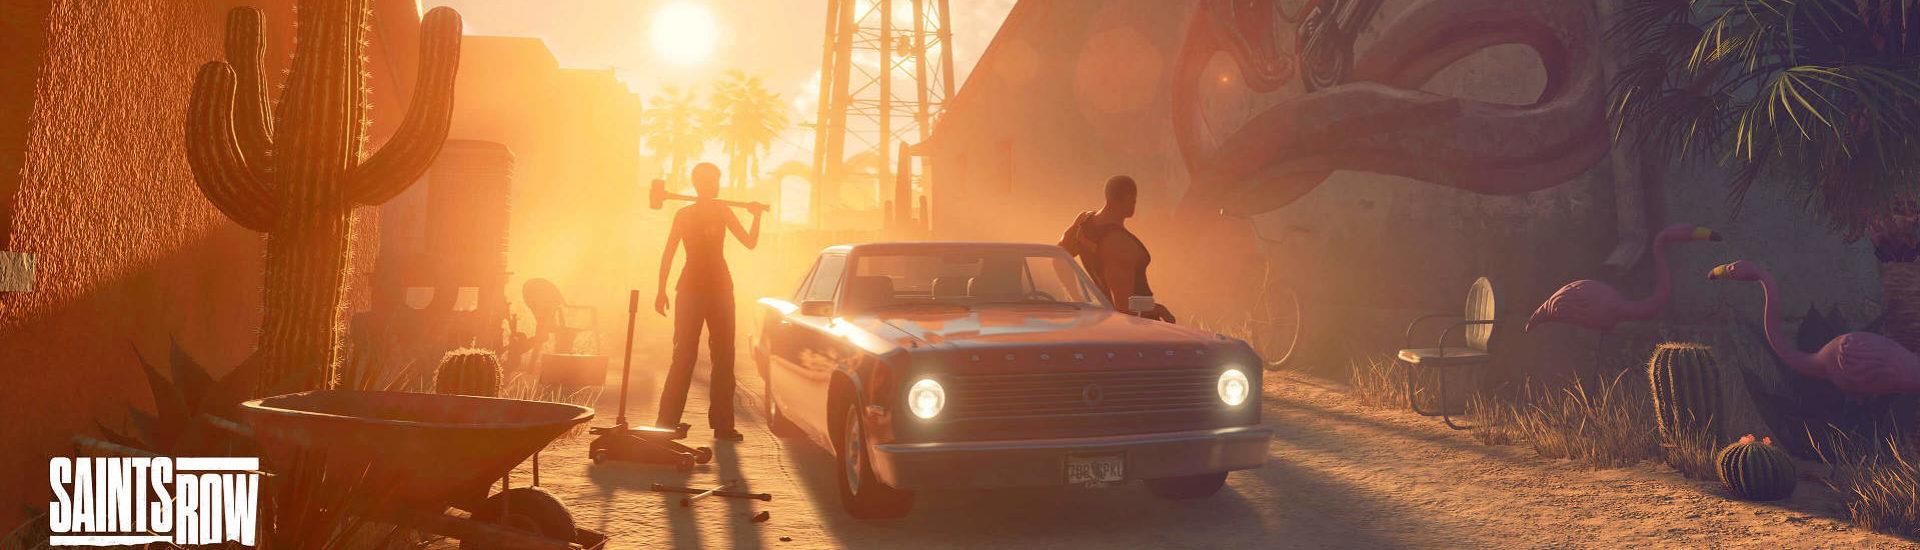 Saints Row: Trailer zeigt riesige Welt